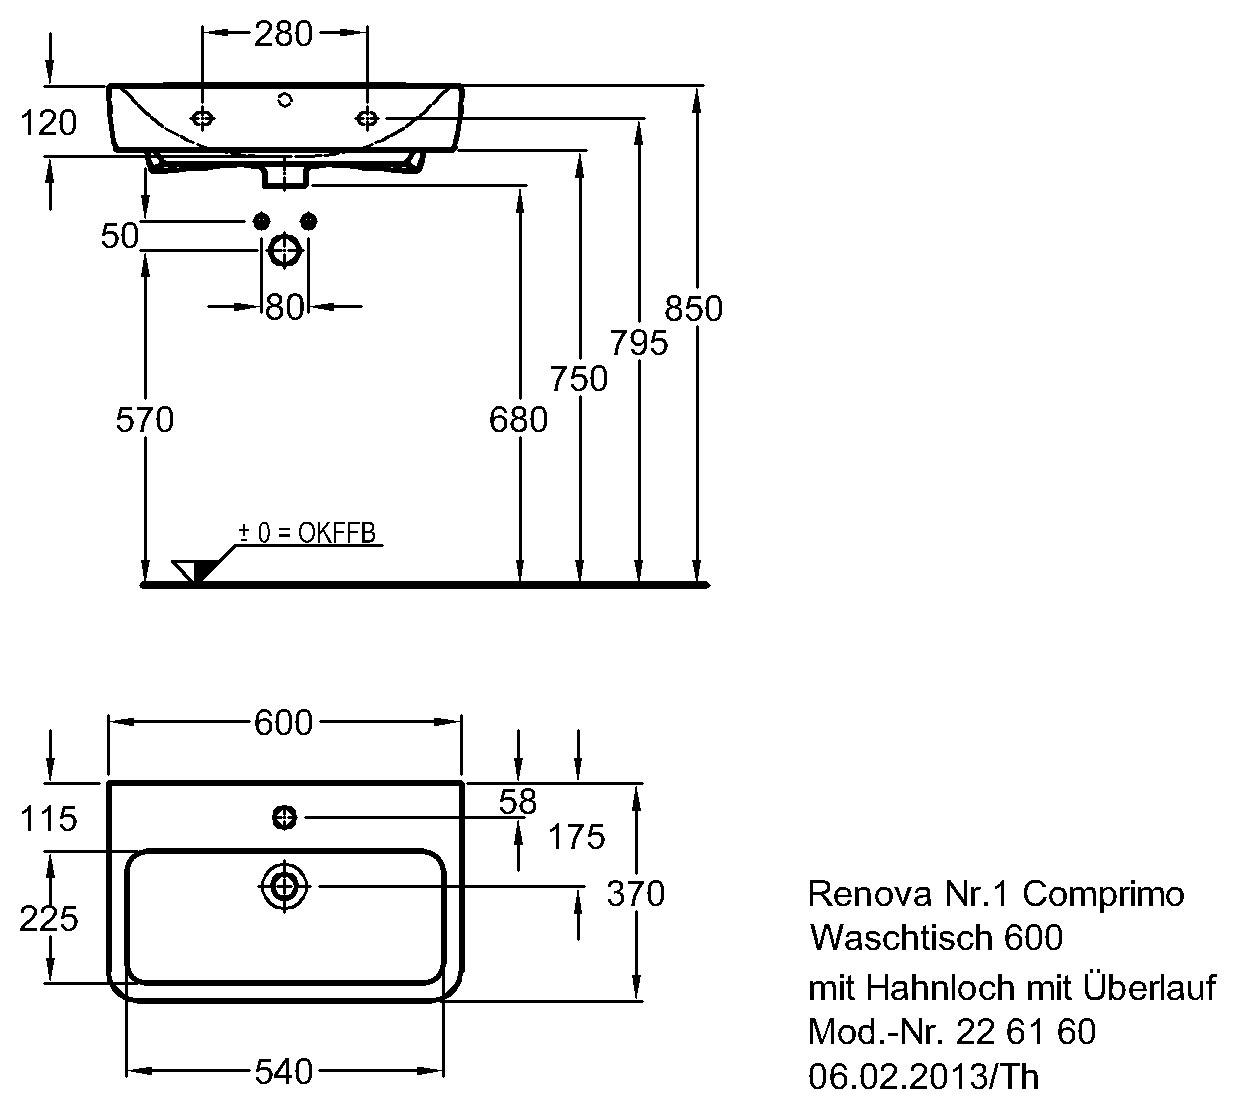 keramag renova nr 1 comprimo waschtisch 600mm x 370mm wei alpin keratect 226160600. Black Bedroom Furniture Sets. Home Design Ideas